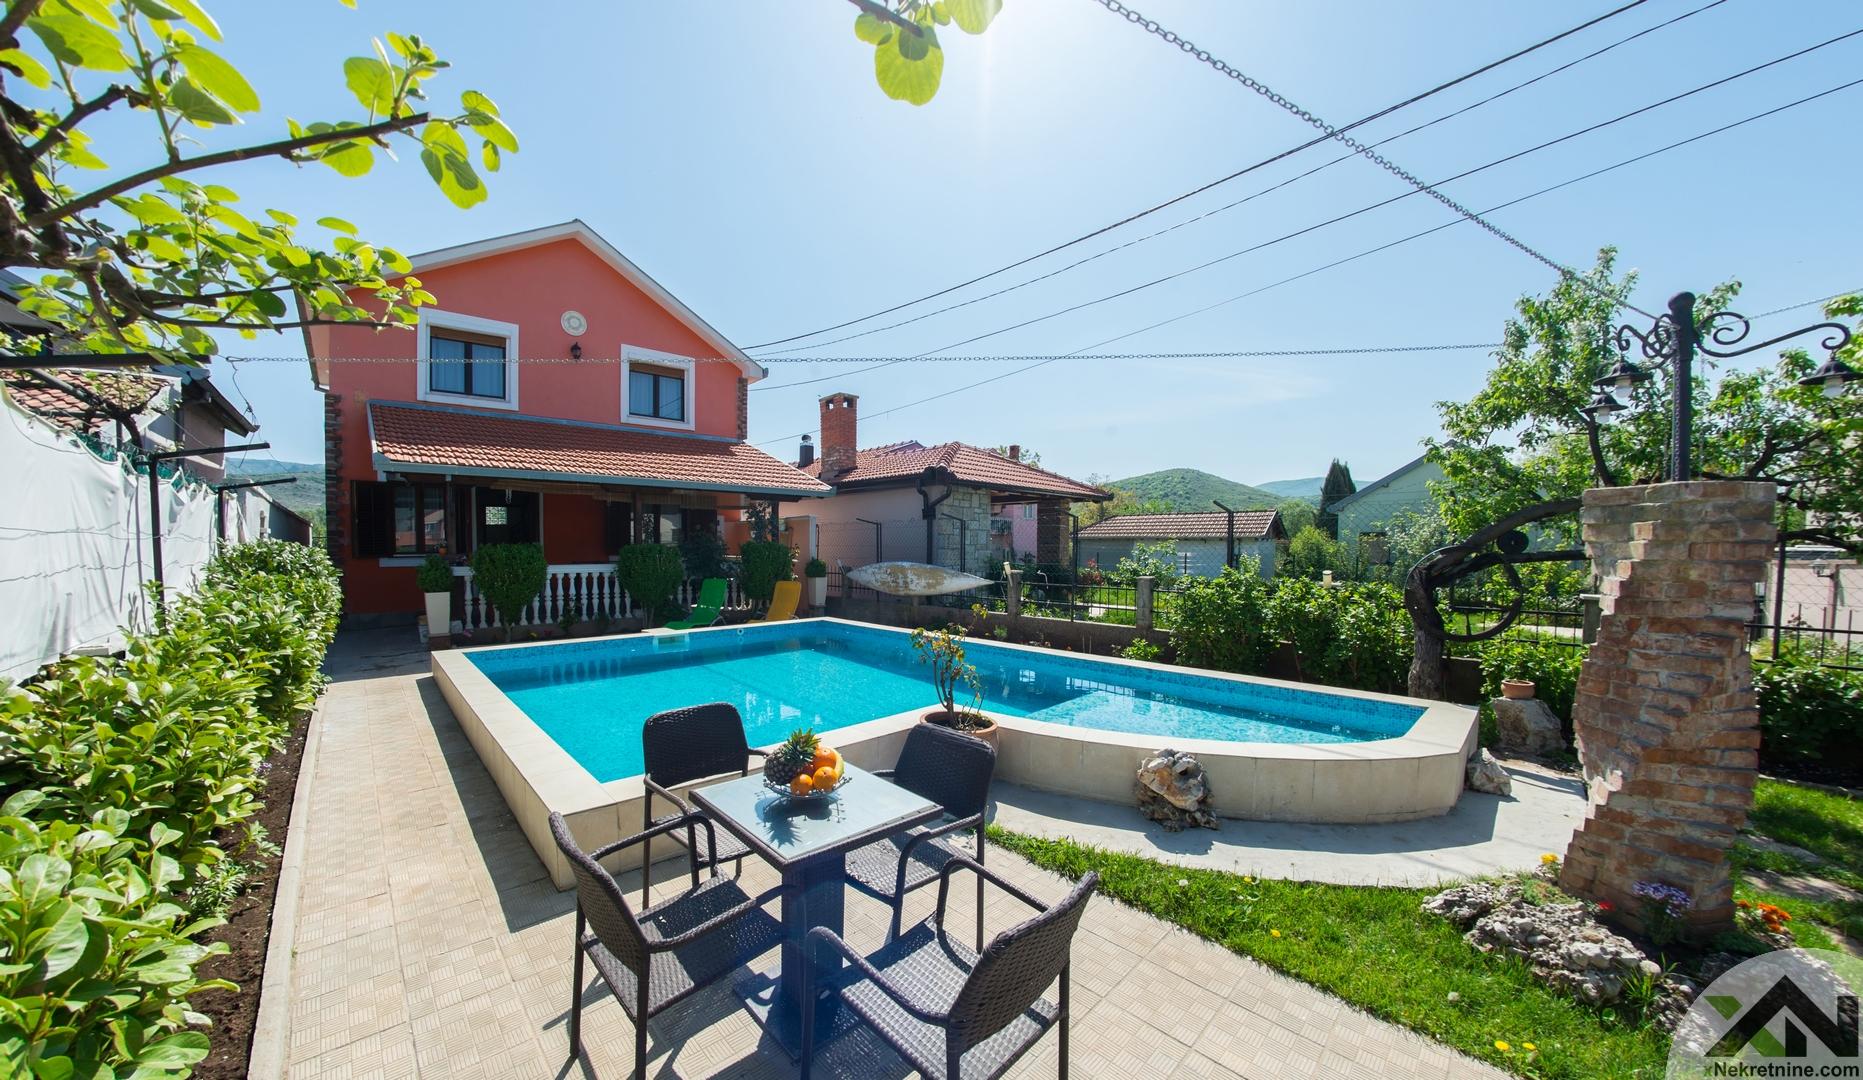 Prekrasna vikendica - Kosor(Mostar)